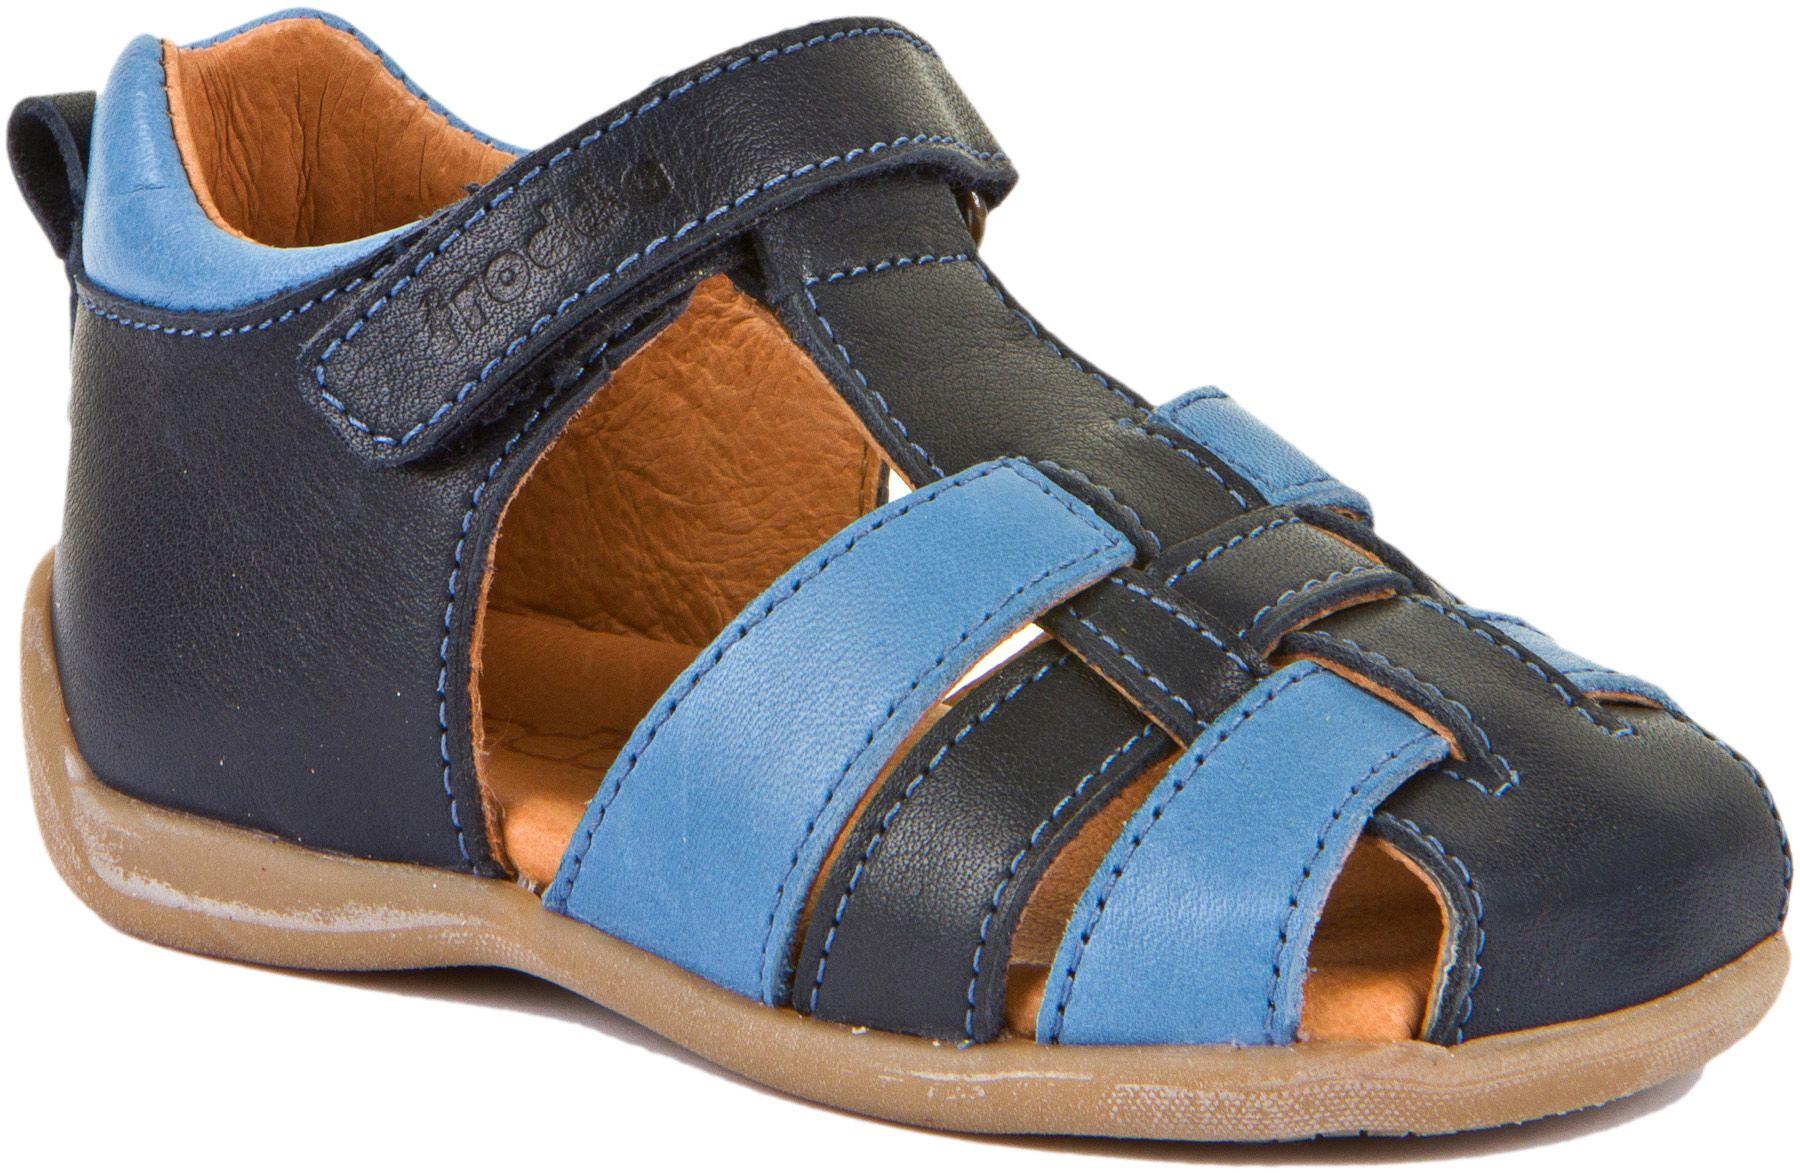 Froddo Lauflerner Sandale Blau+